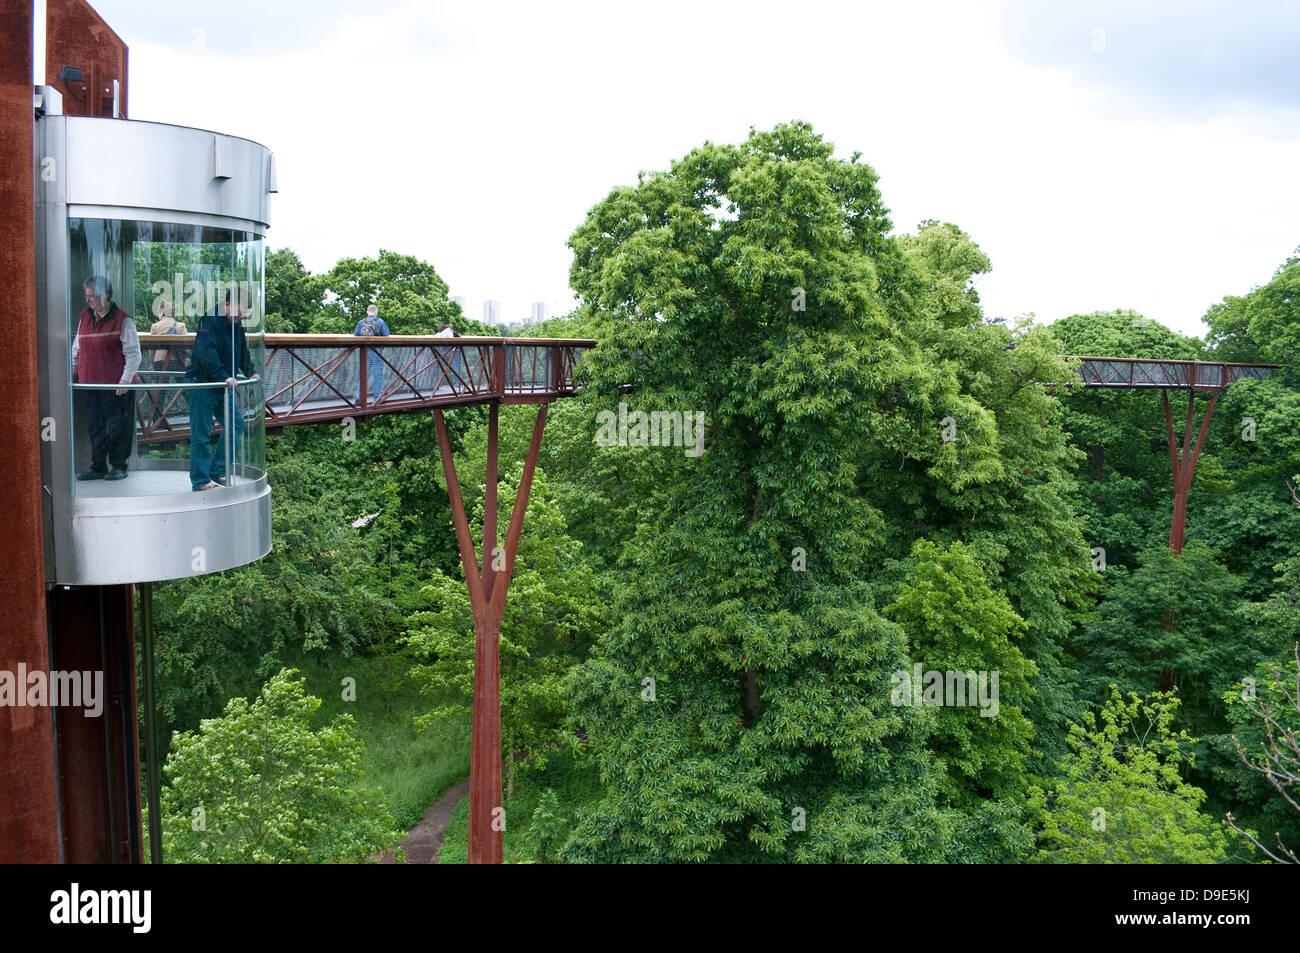 Xstrata Treetop Walkway, Kew Royal Botanic Gardens, London, UK - Stock Image